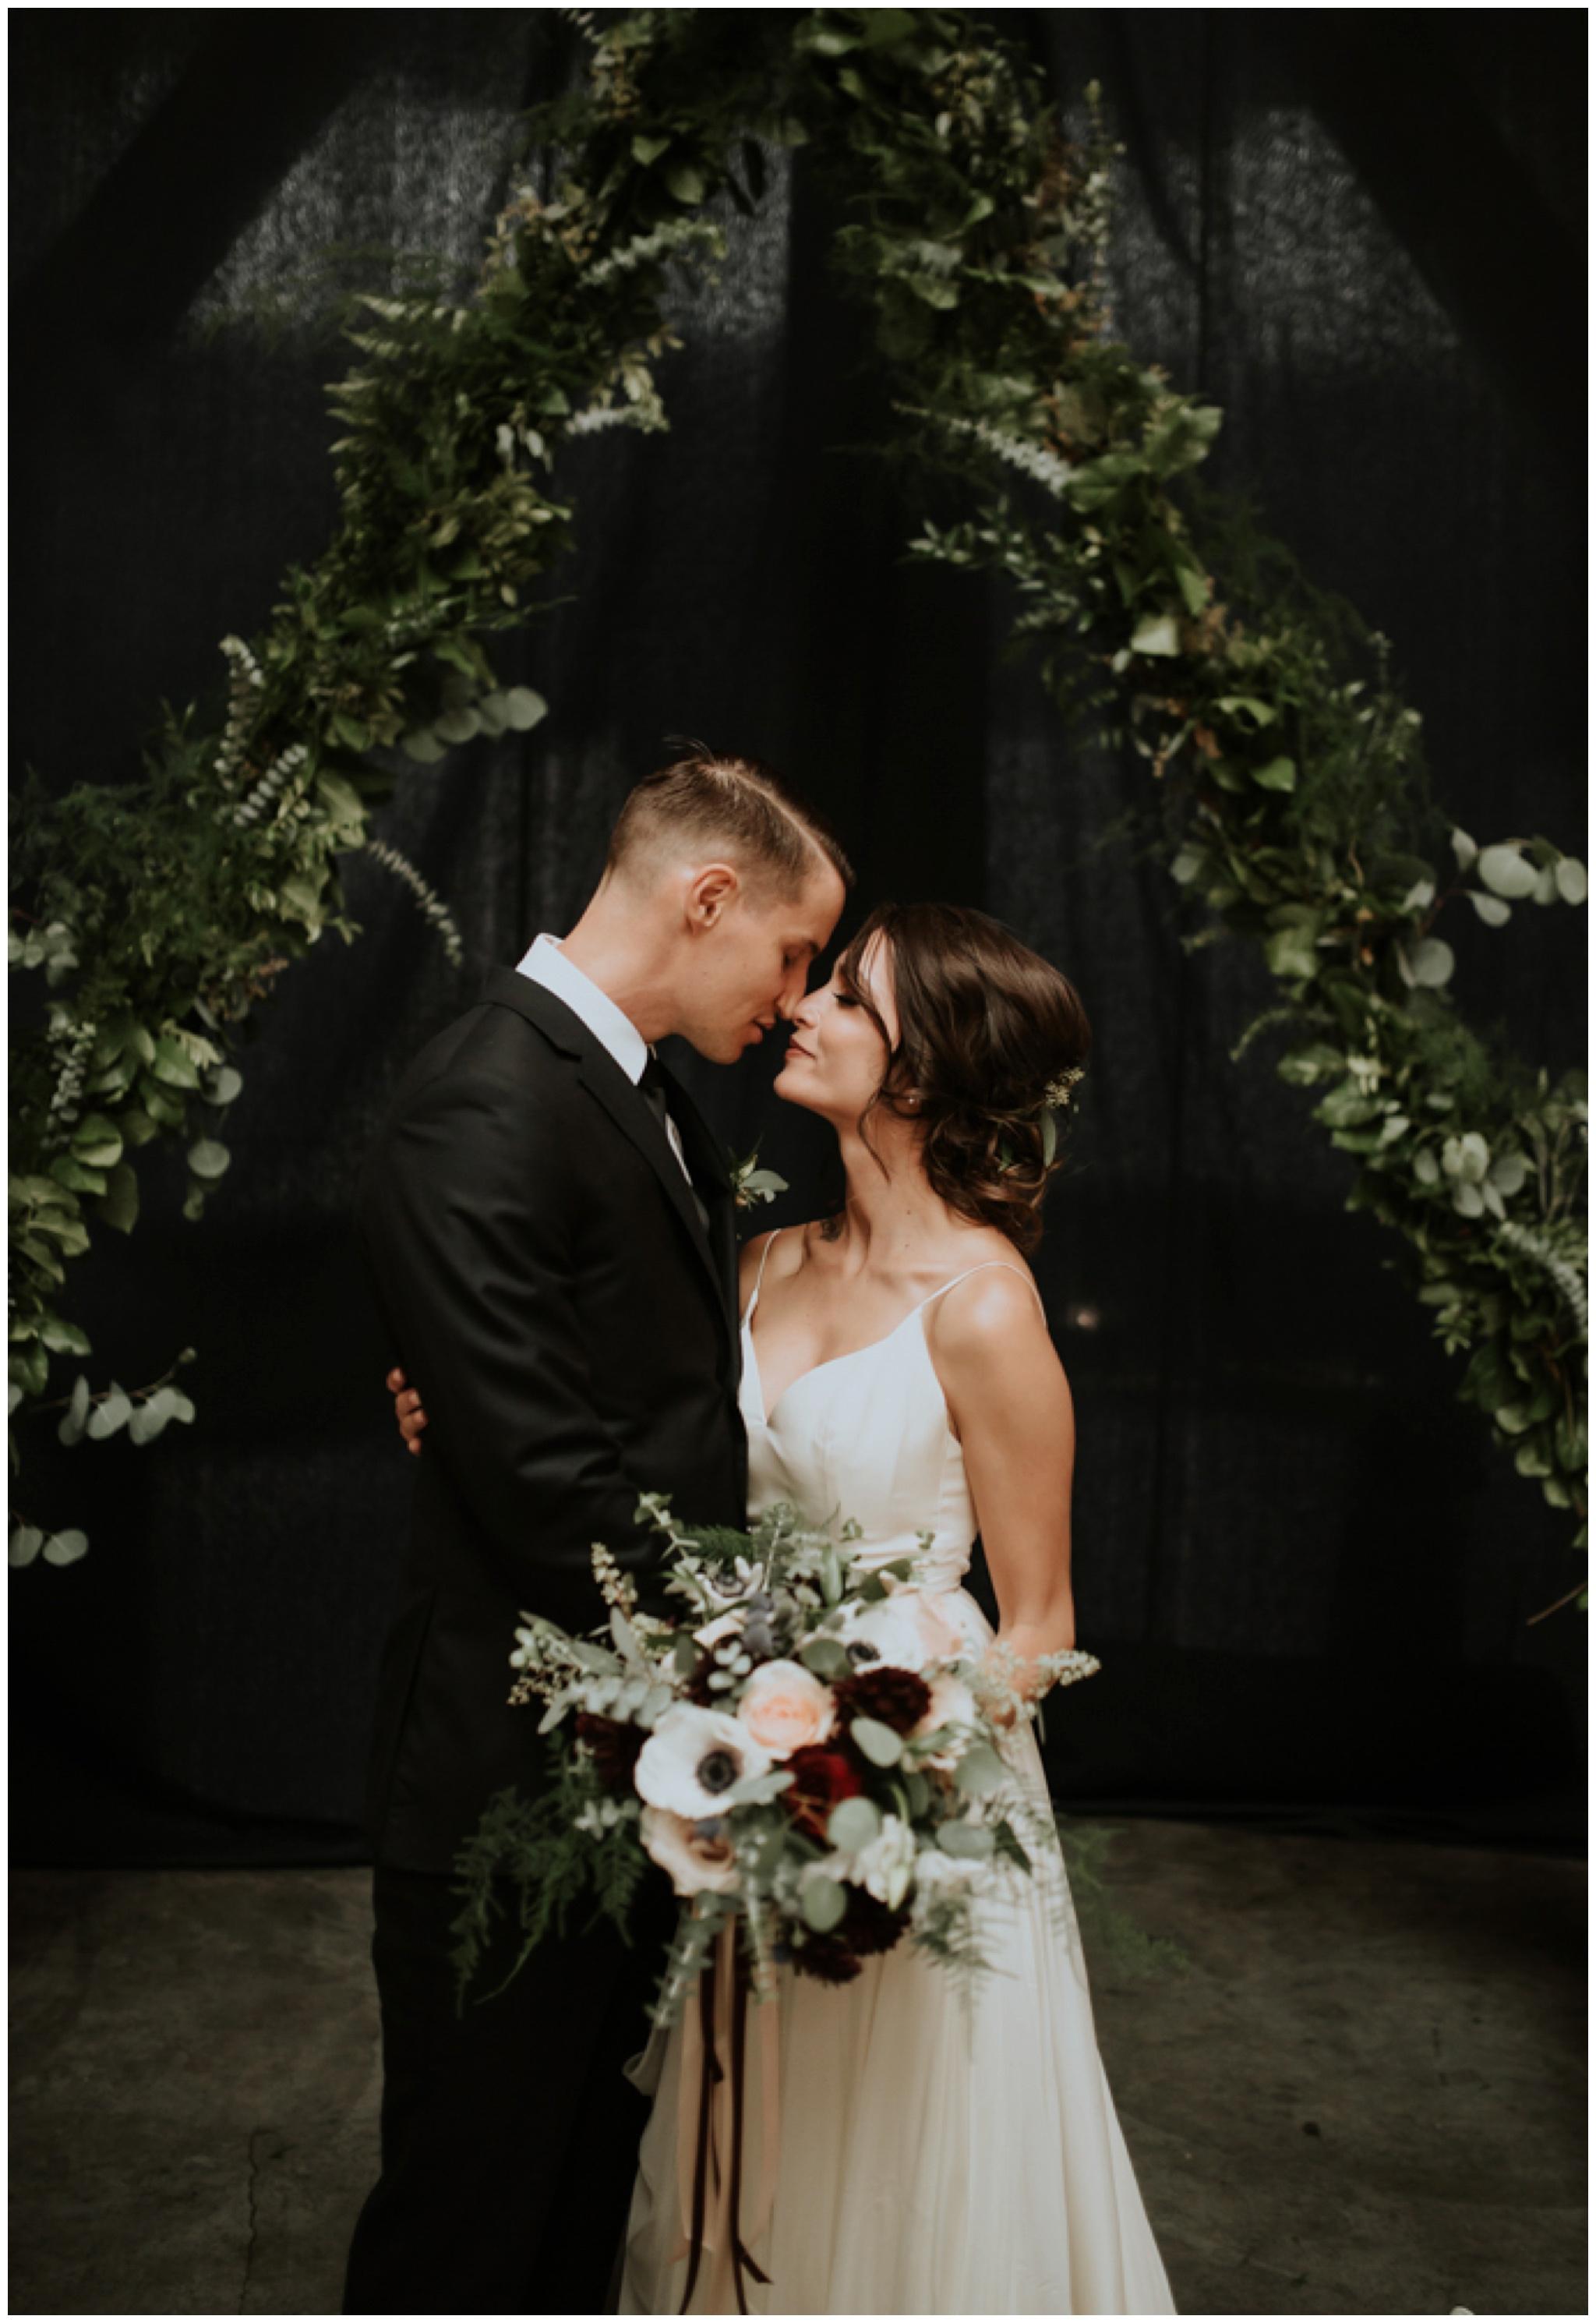 alyssa-keiran-westland-distillery-urban-seattle-wedding-photographer-caitlyn-nikula-94.jpg